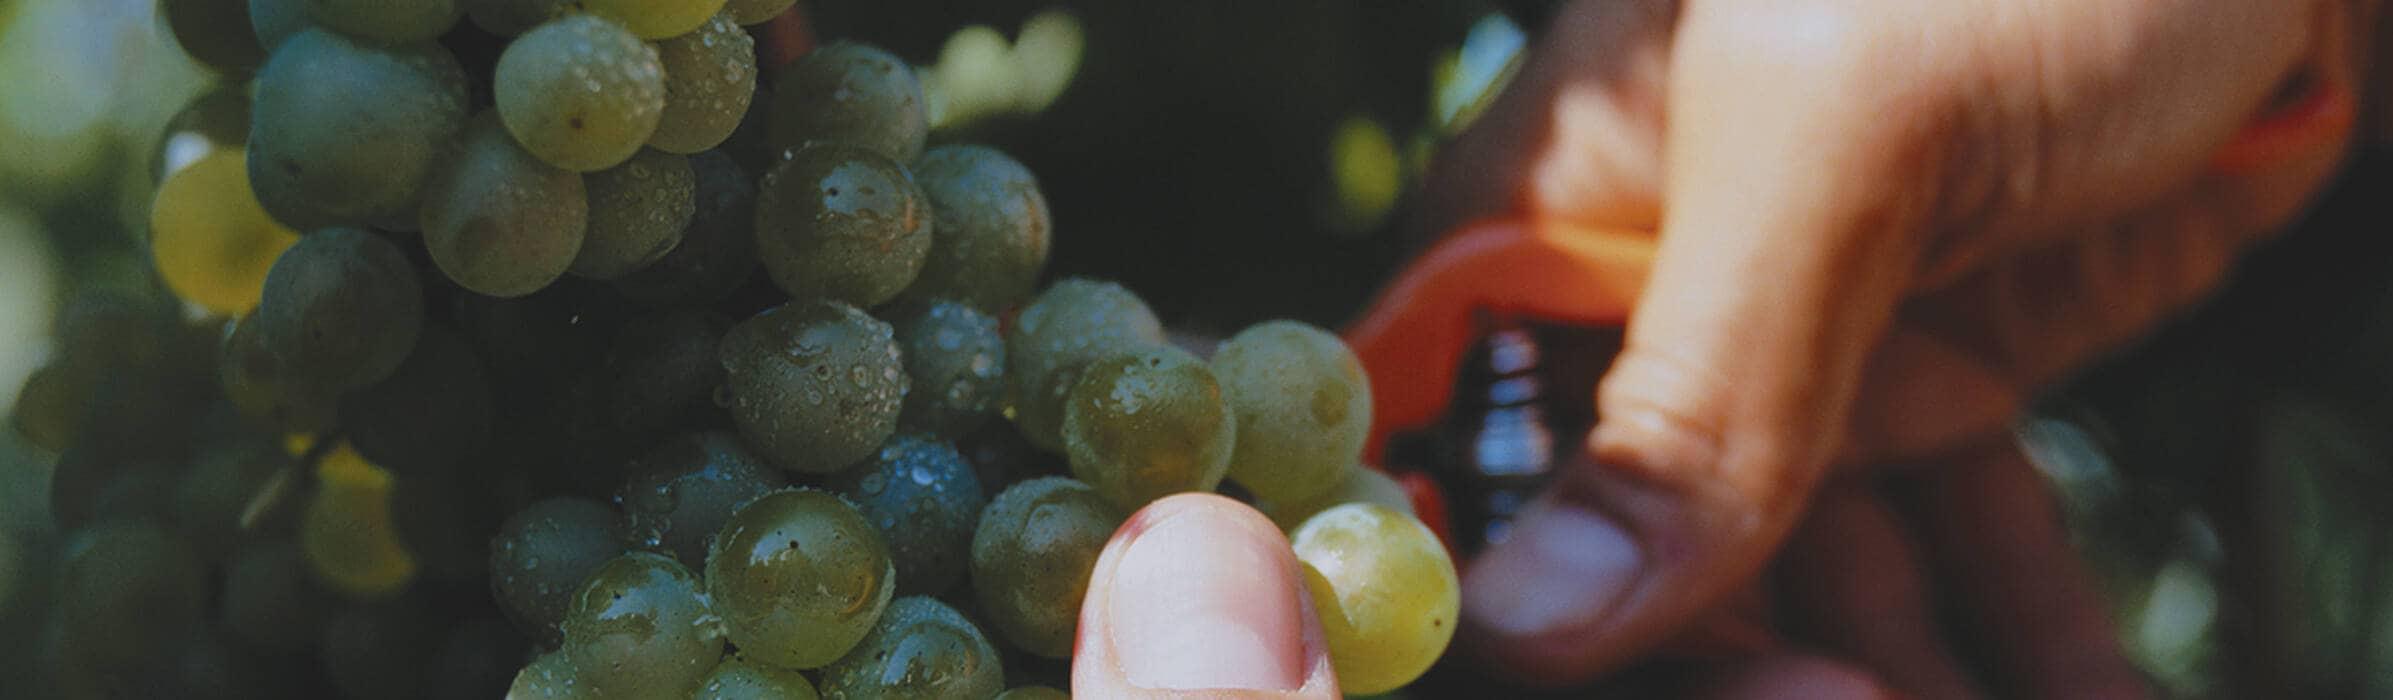 Veuve Clicquot - The Harvest